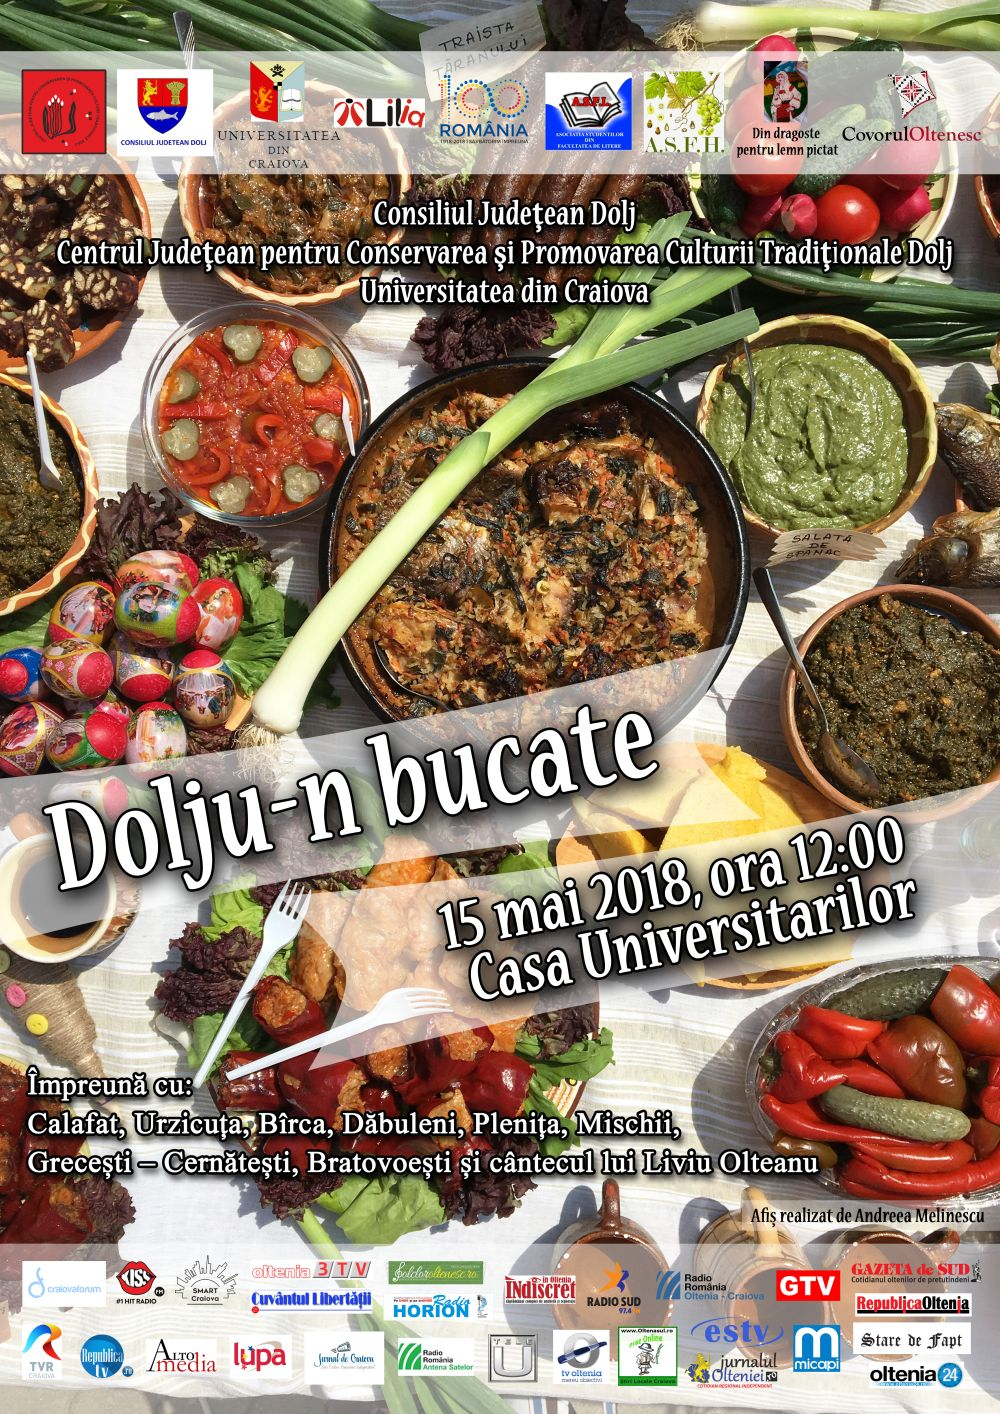 dolju-n_bucate_final_site